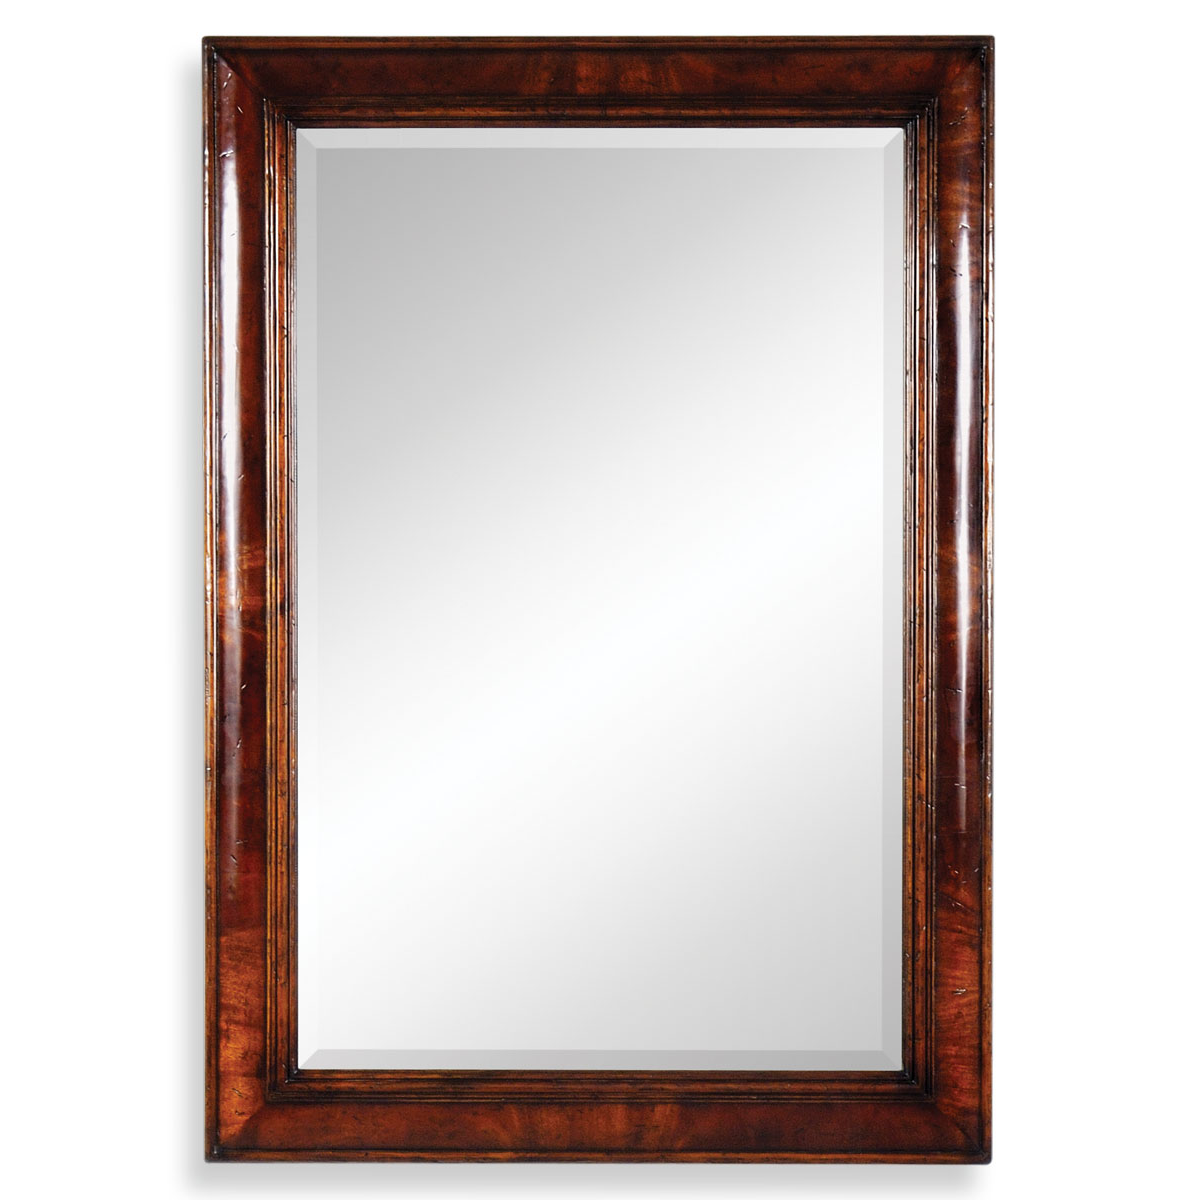 492699 Crotch Mahogany Cushion Framed Mirror - на 360.ru: цены, описание, характеристики, где купить в Москве.